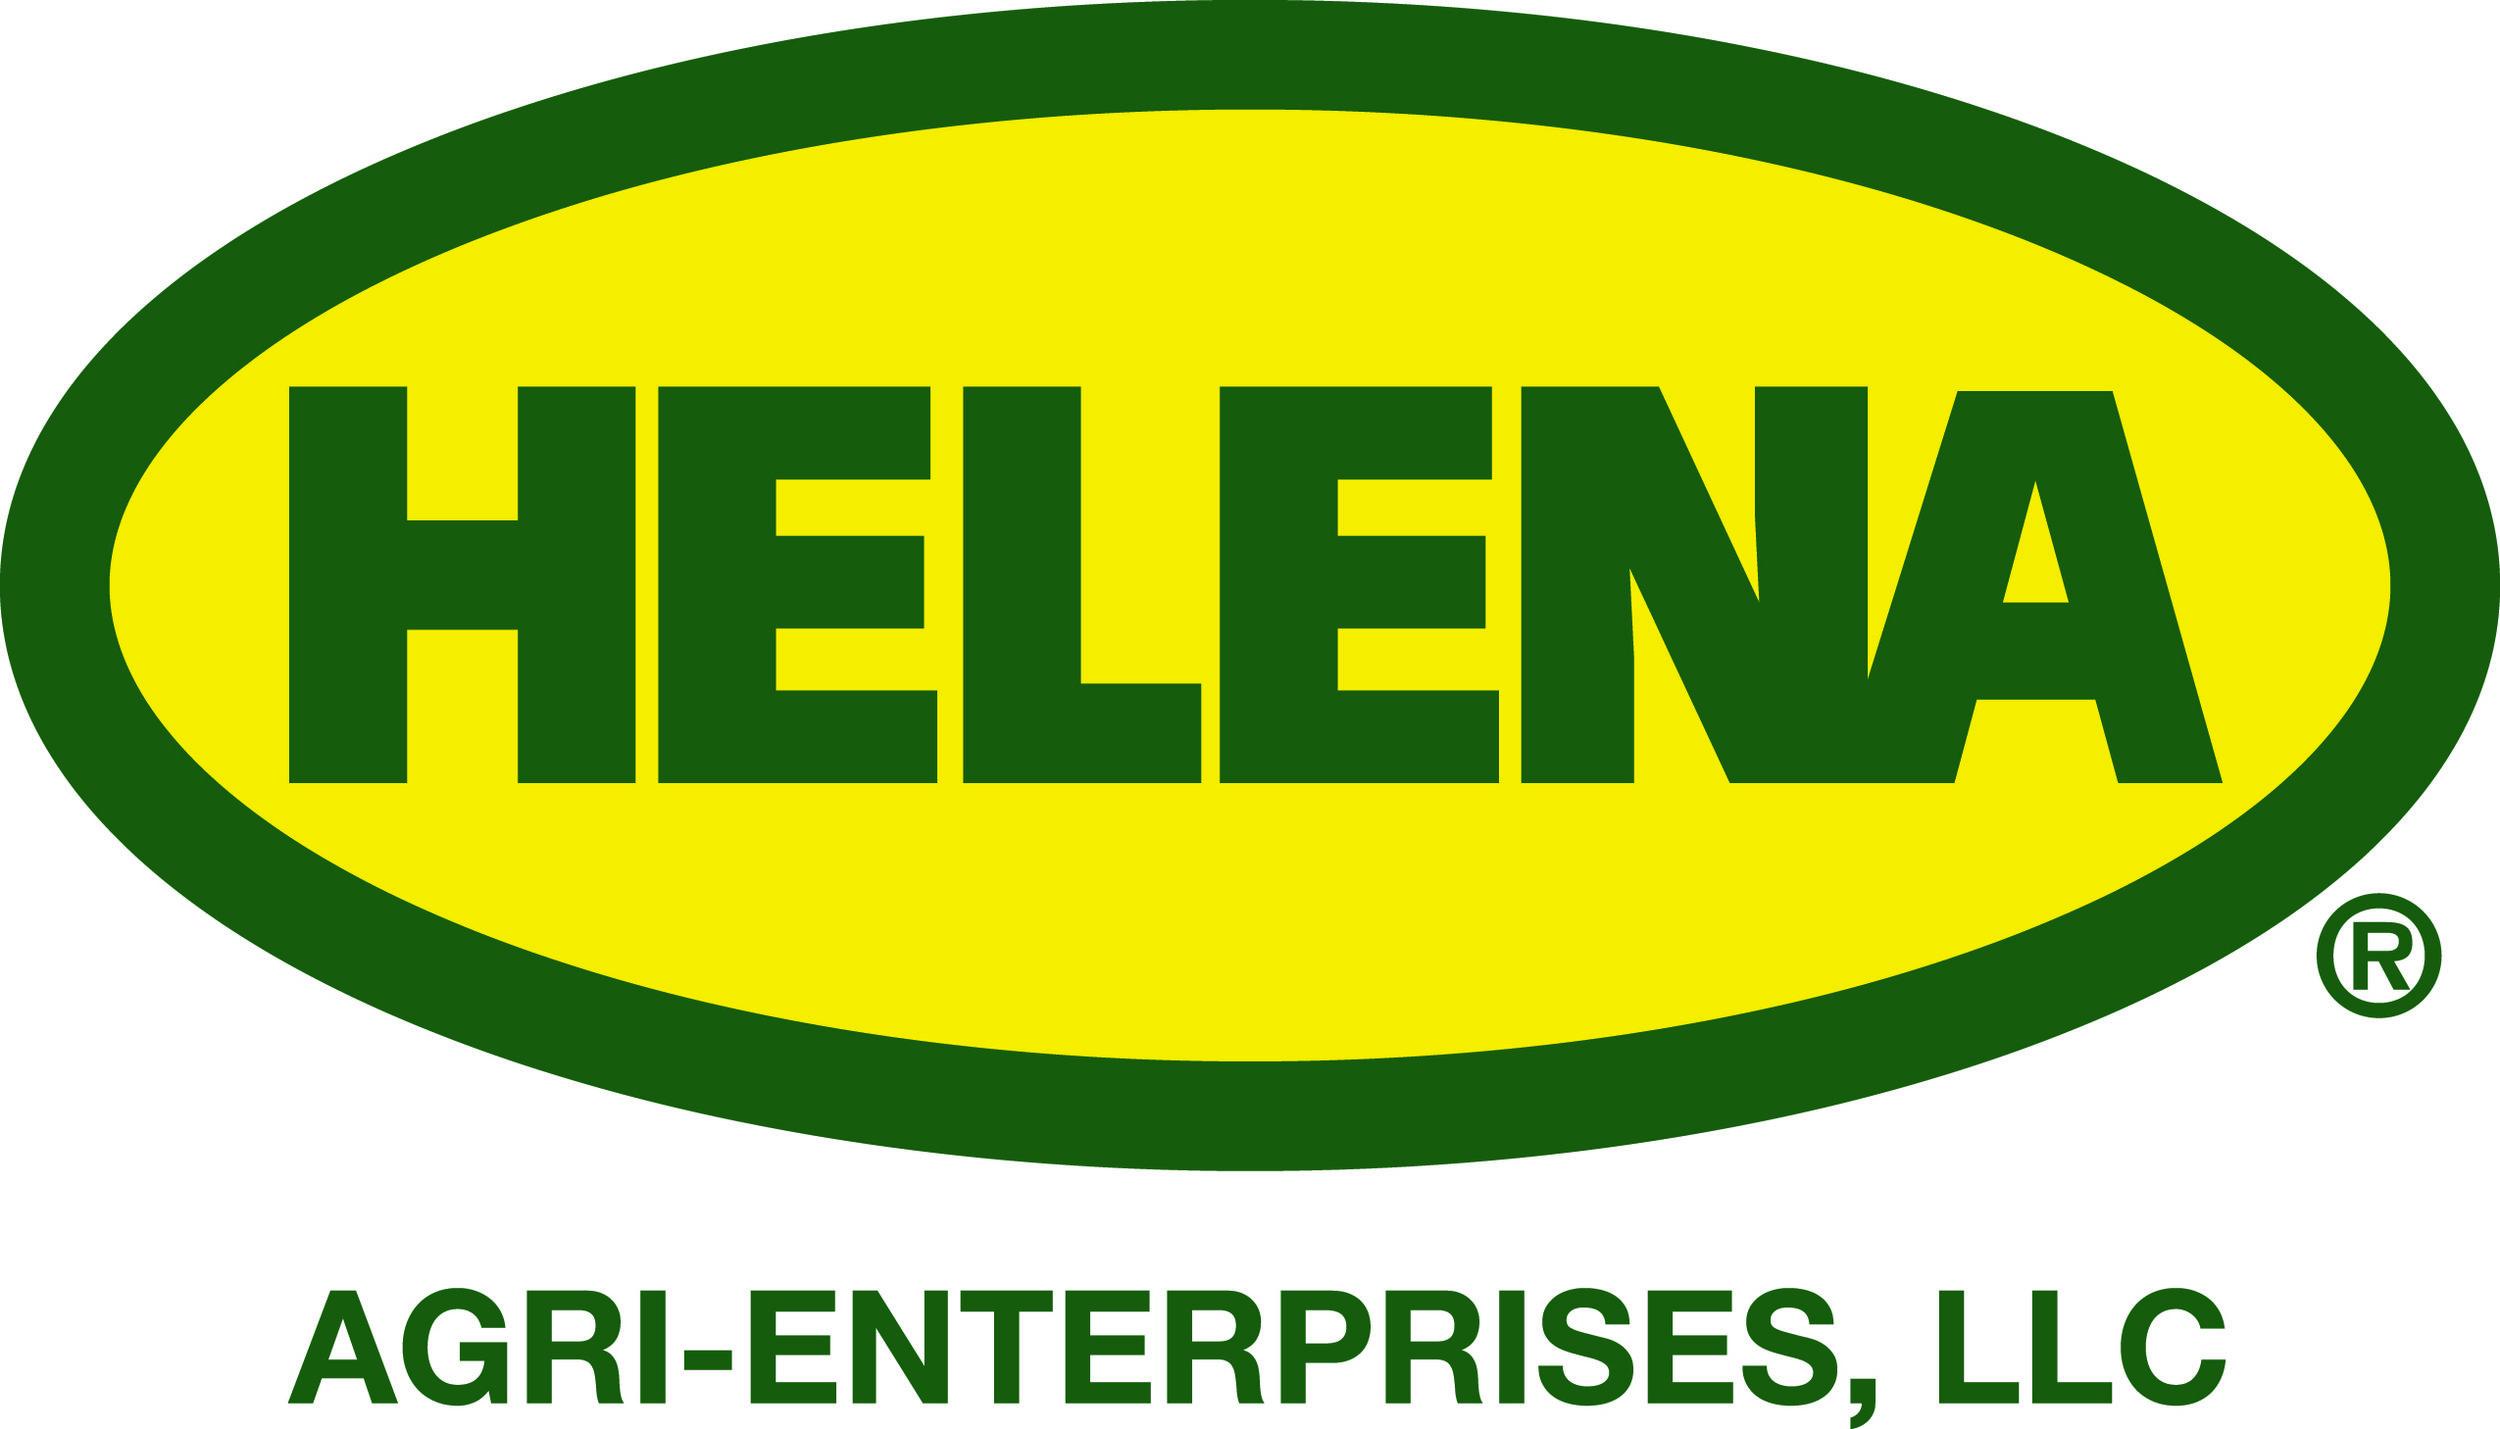 Helena_Agri-Enterprises_2Color.jpg